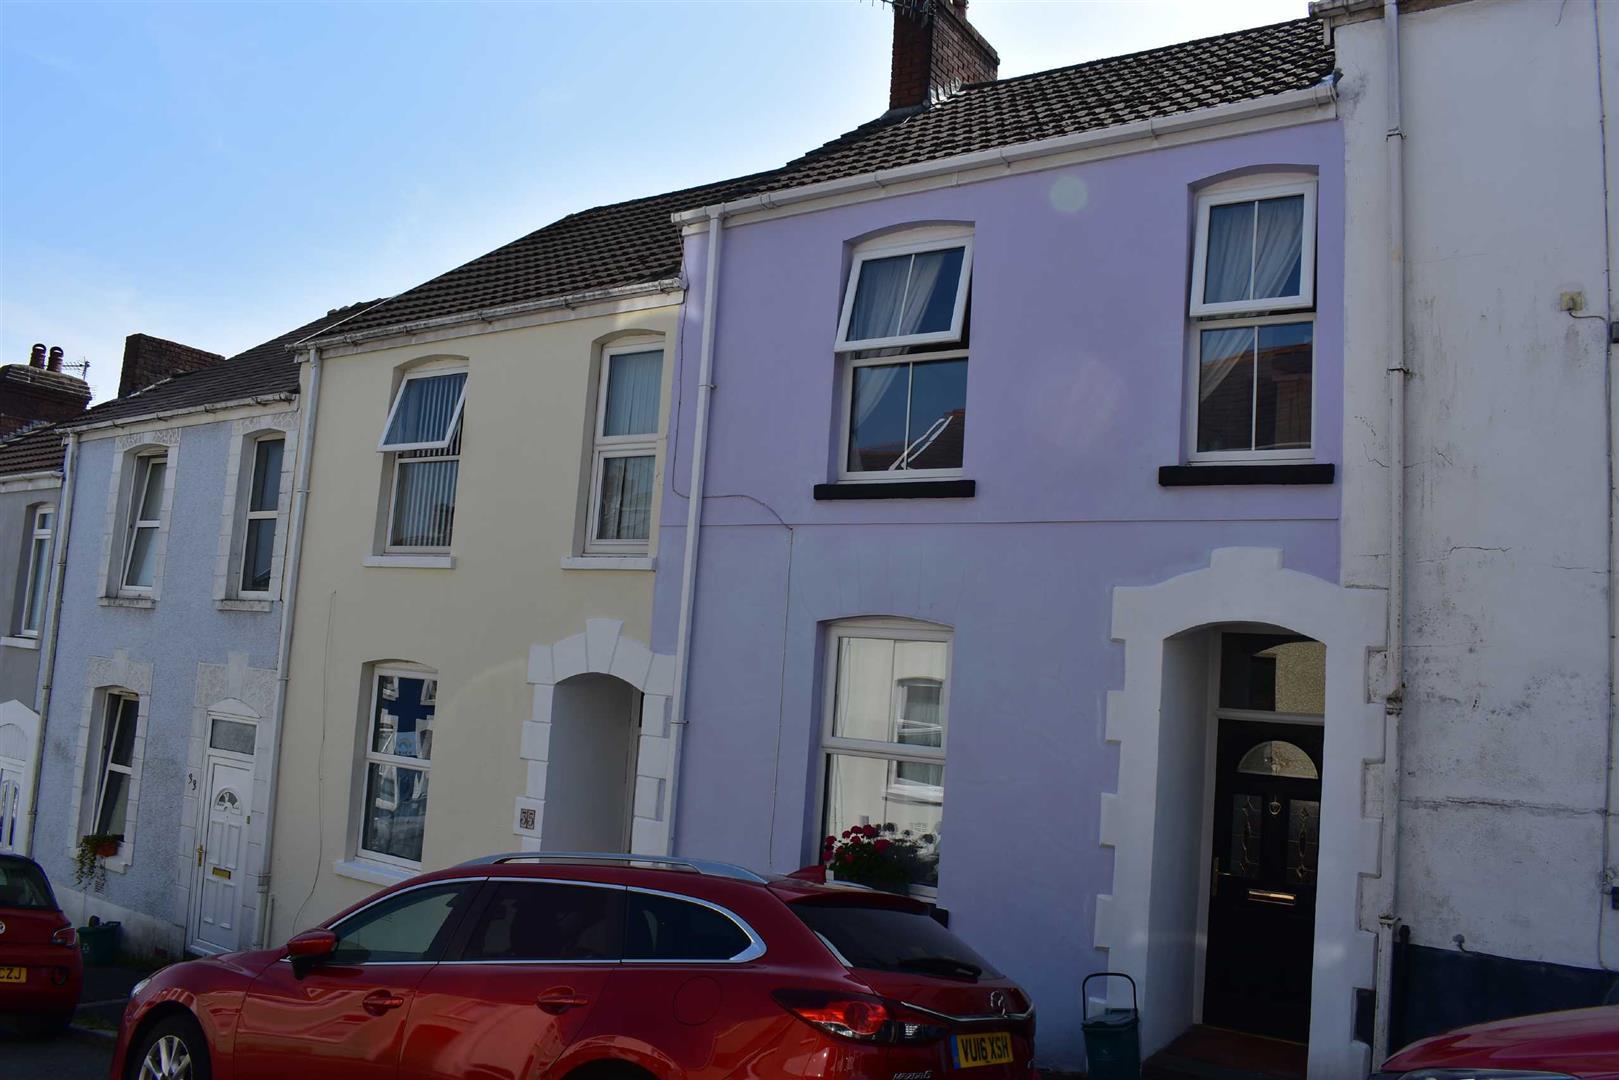 Cambridge  Street, Uplands, Swansea, SA2 0NB